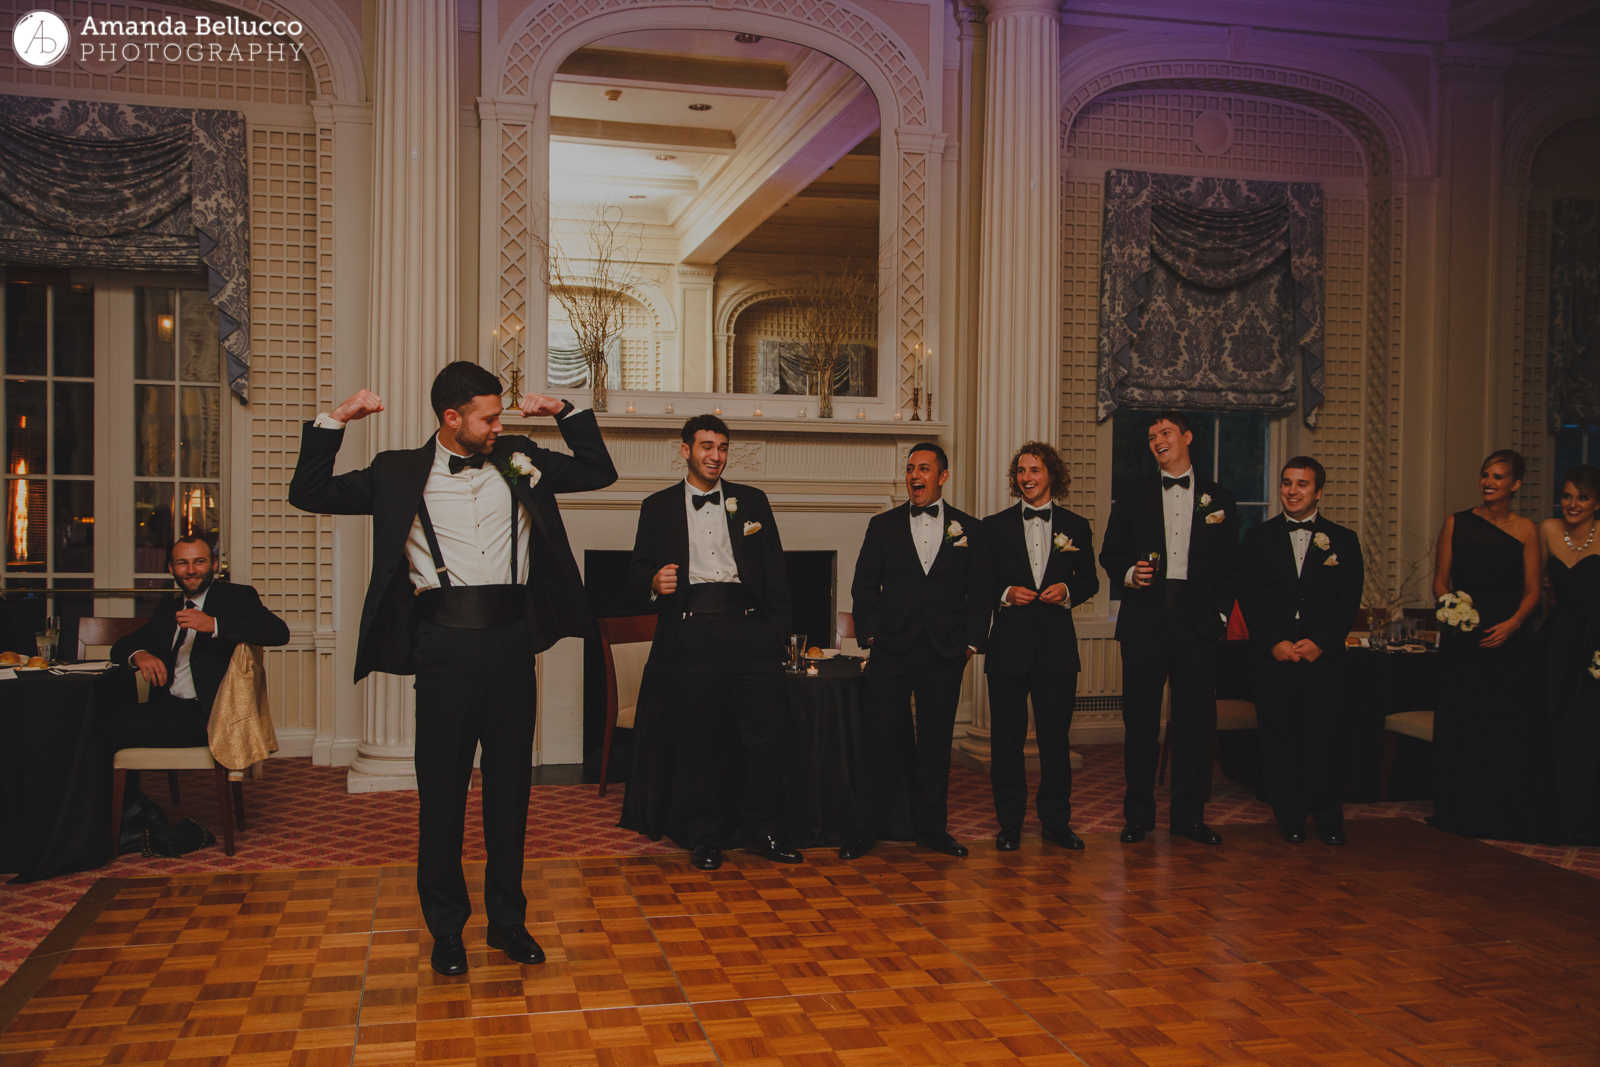 syracuse-rochester-fine-art-wedding-photographer-142.JPG